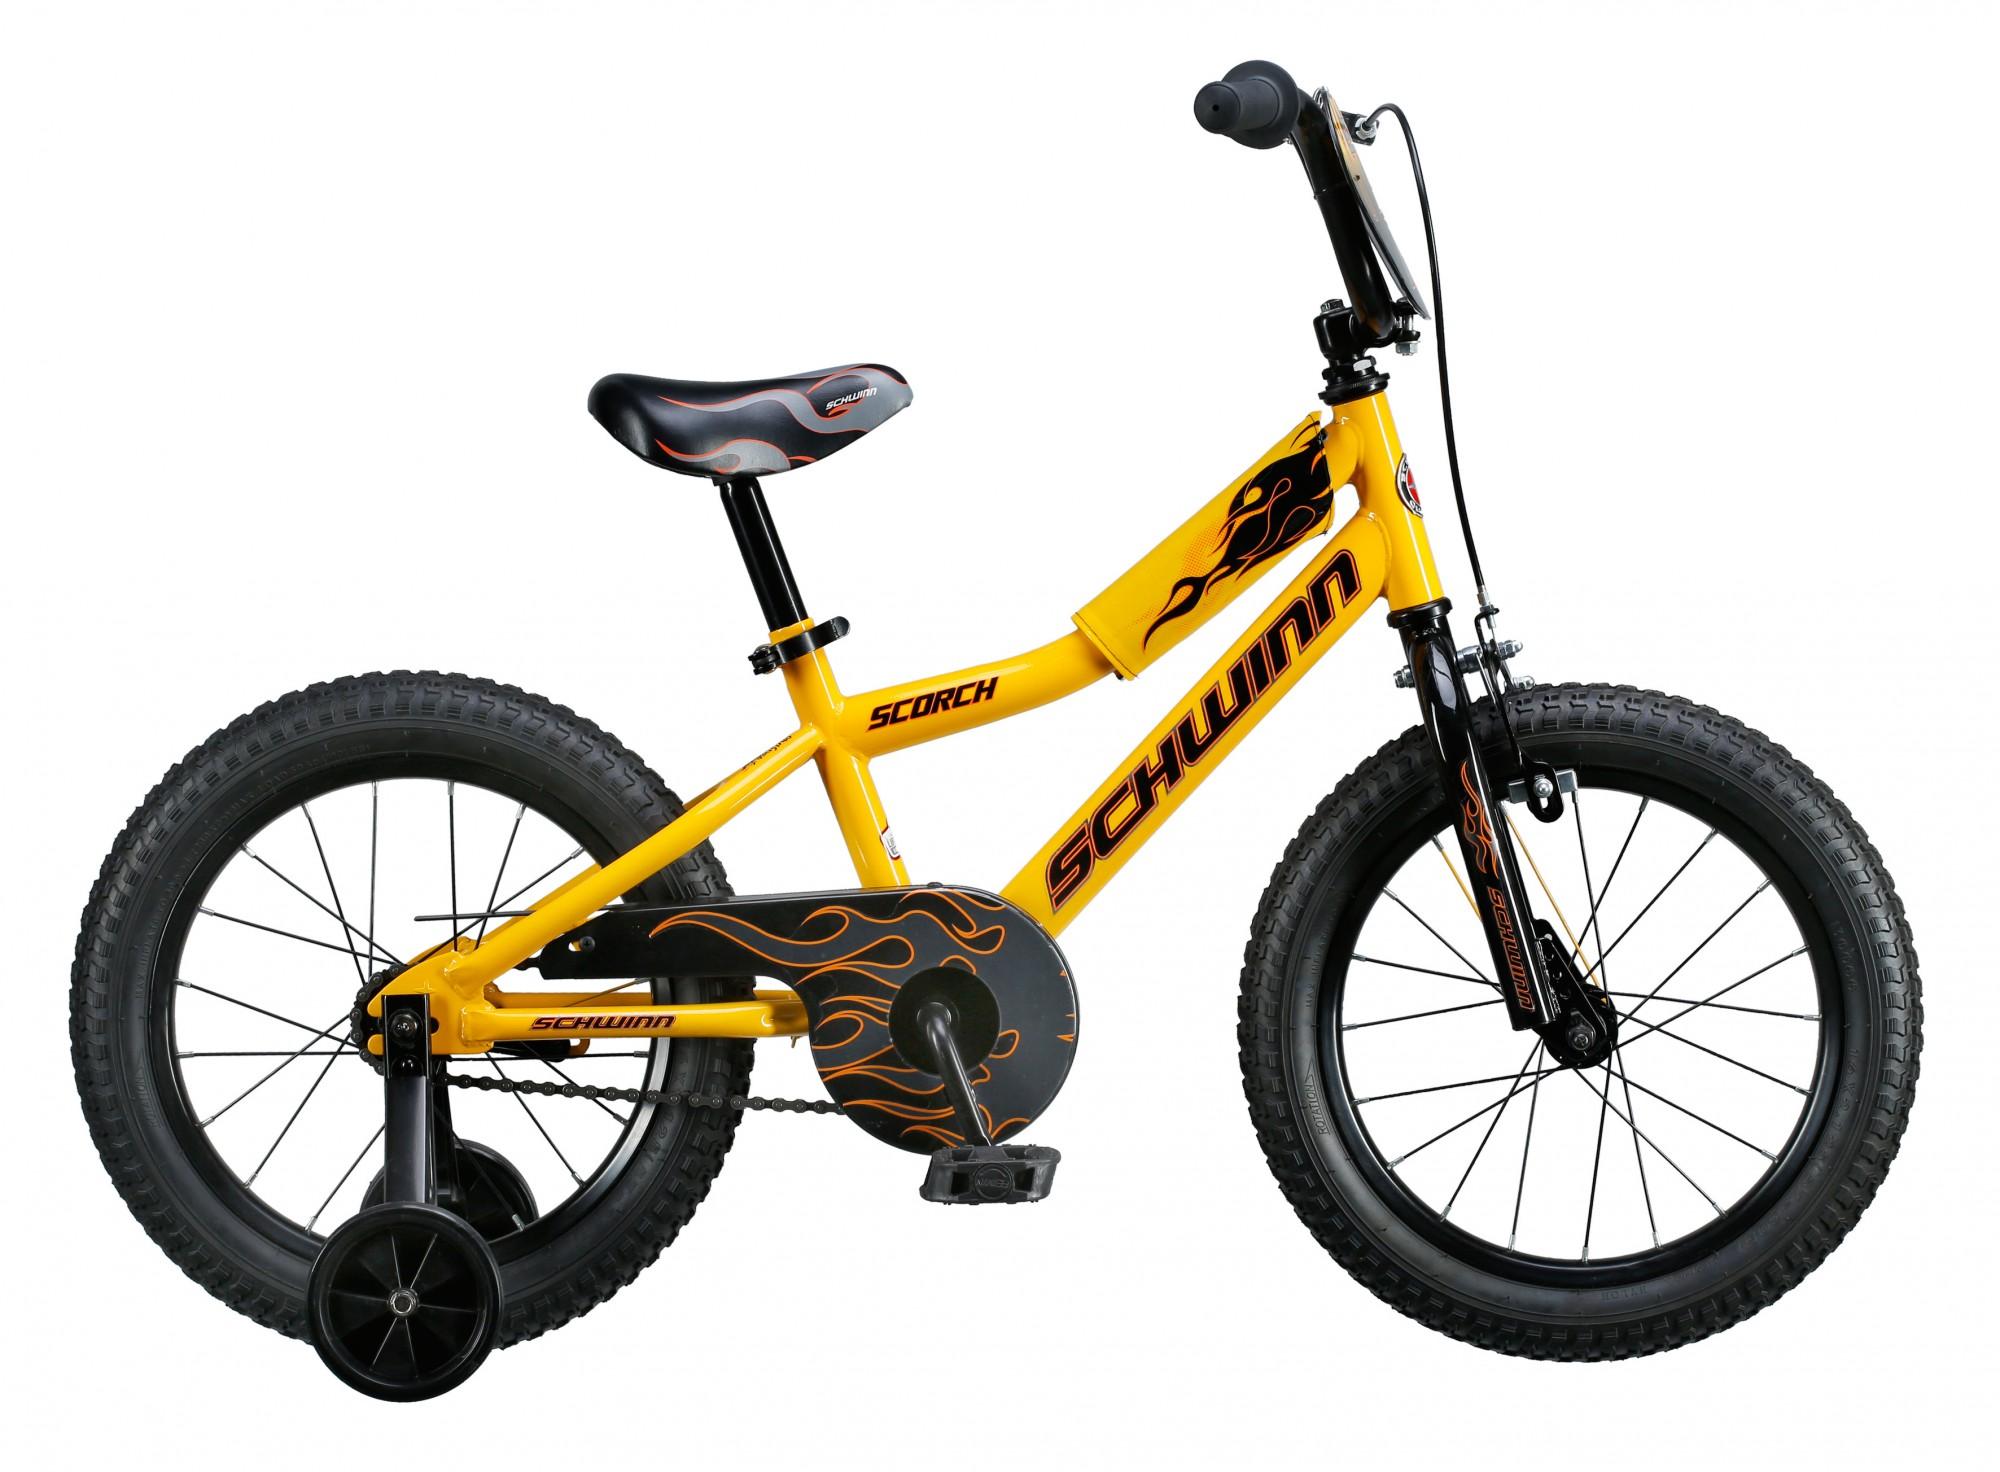 Велосипед SCHWINN Scorch 16 yellow - артикул: 826200390